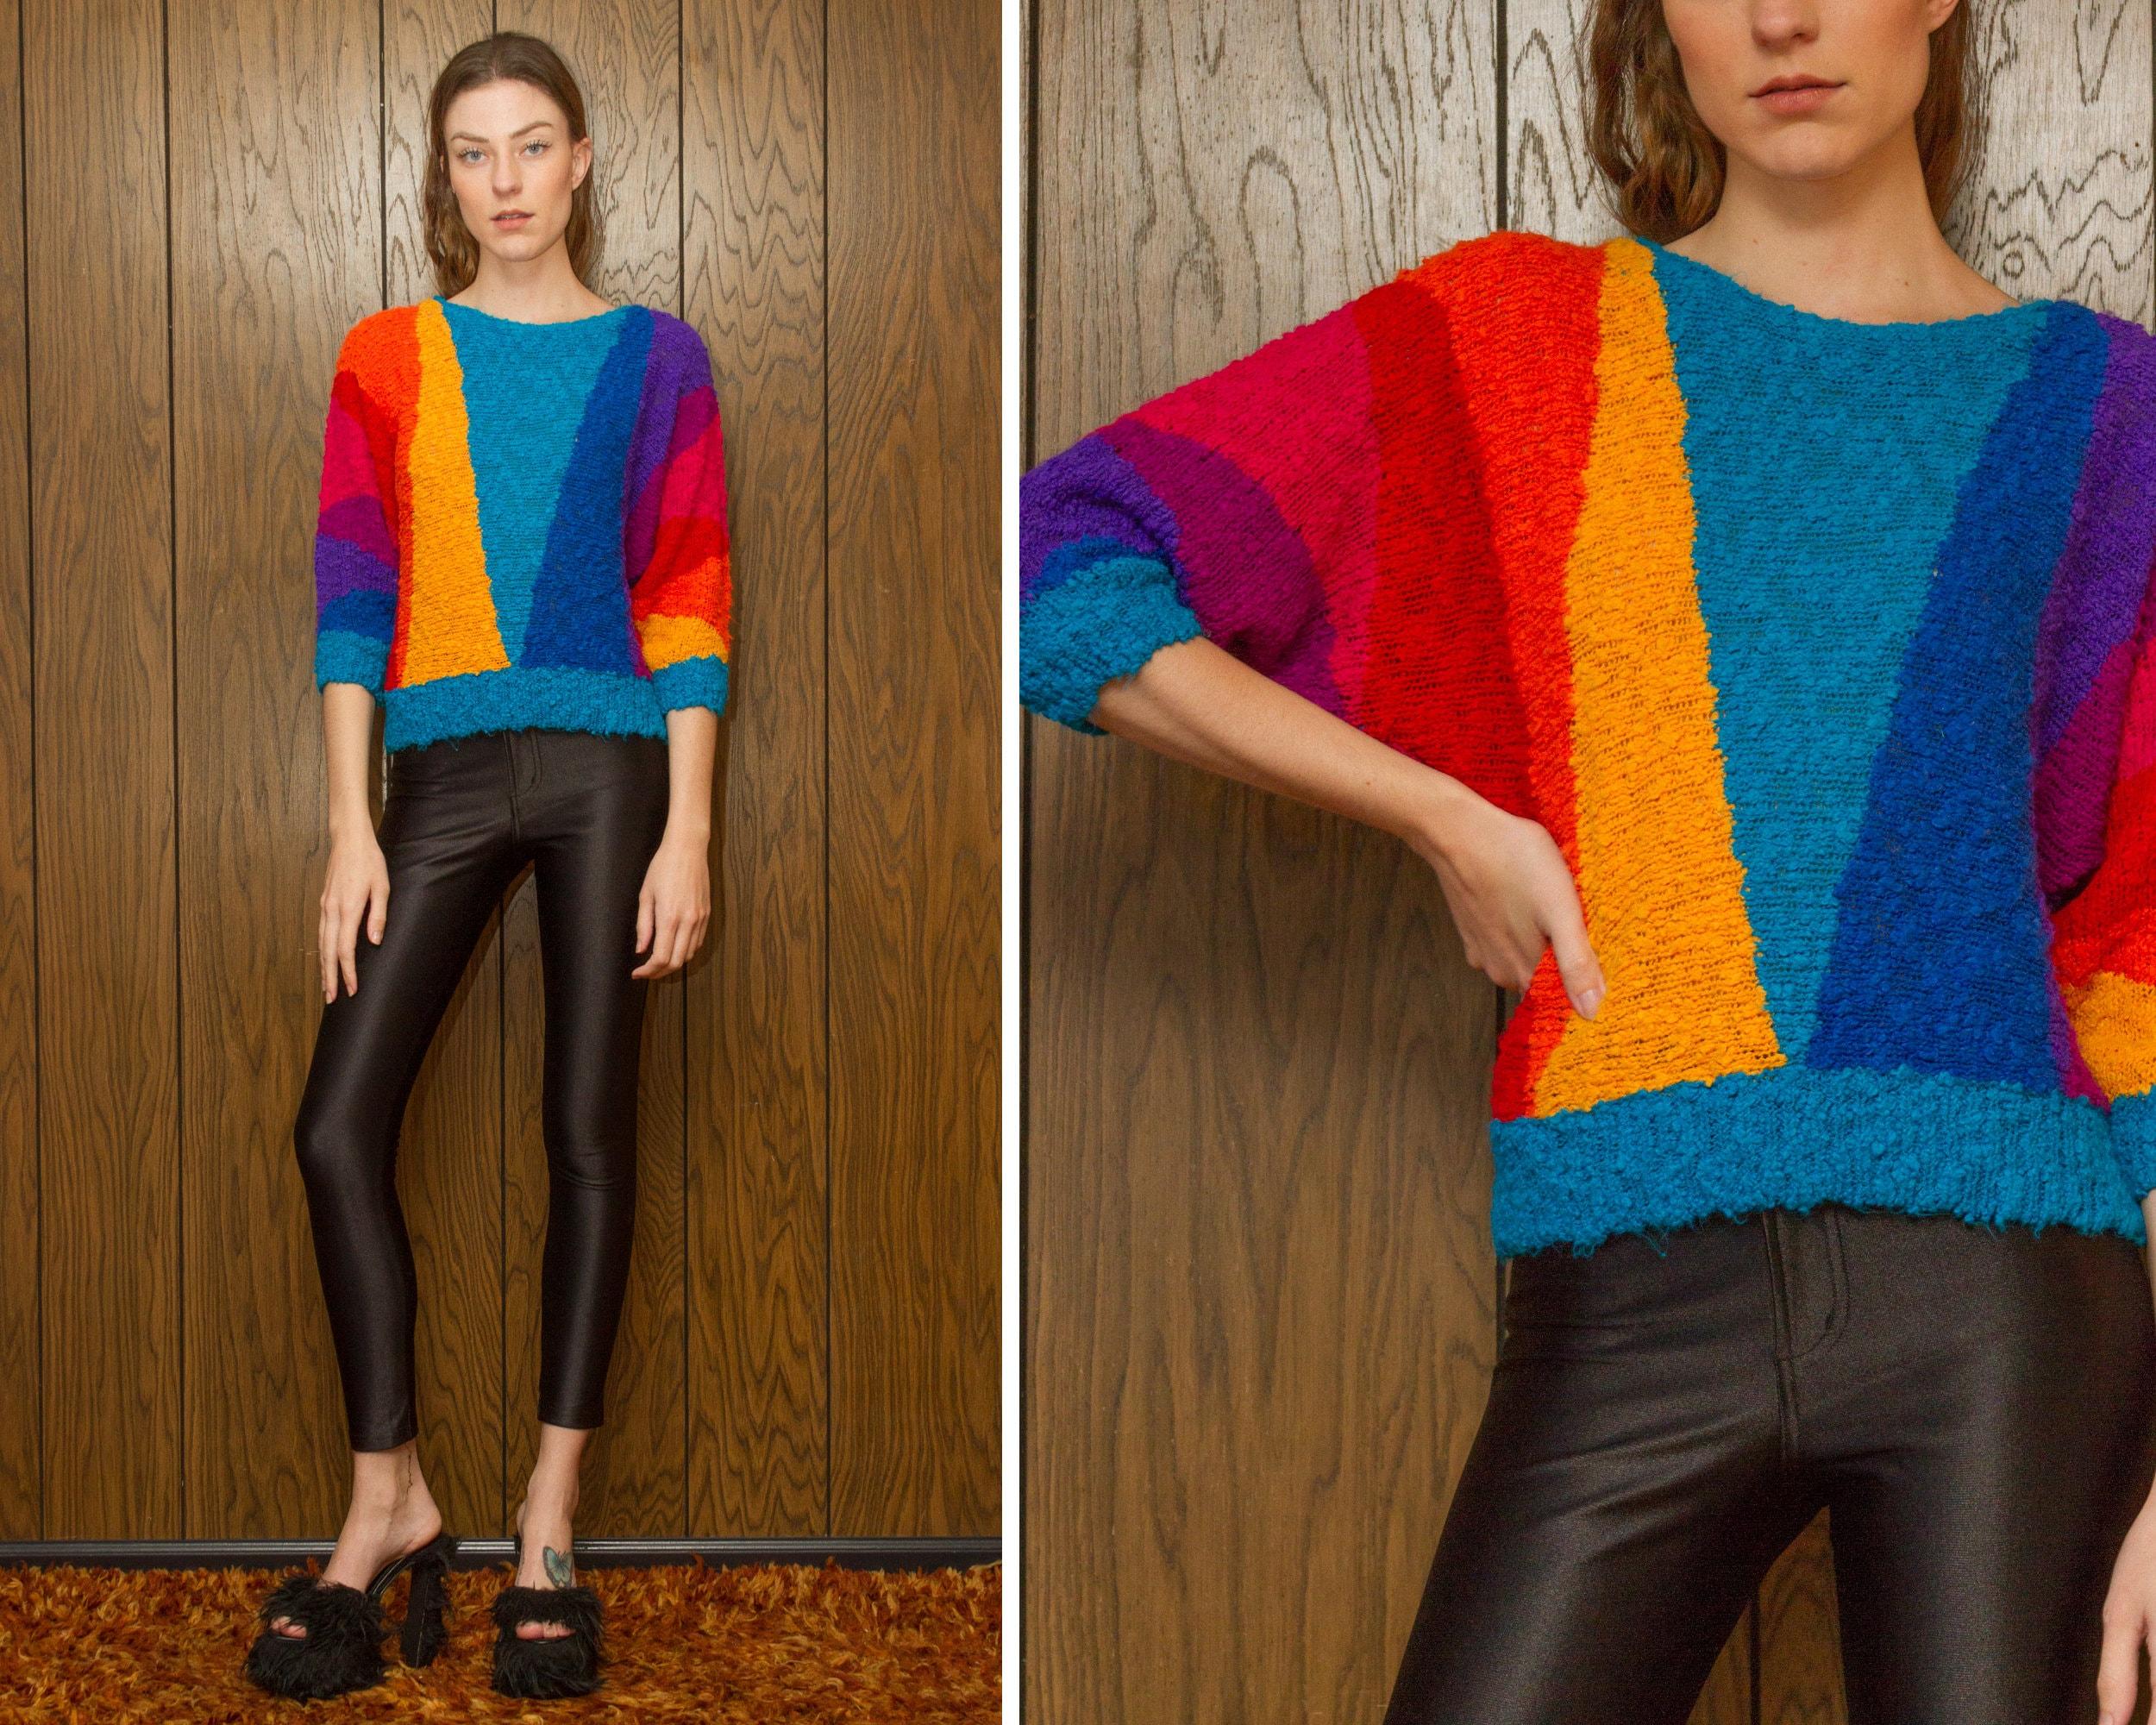 cba53aec151405 Vintage 80s Gitano Knit Textured Graphic Triangle Rainbow Striped Multi  Color Boatneck Lightweight Drop Shoulder Half Dolman Sleeve Sweater